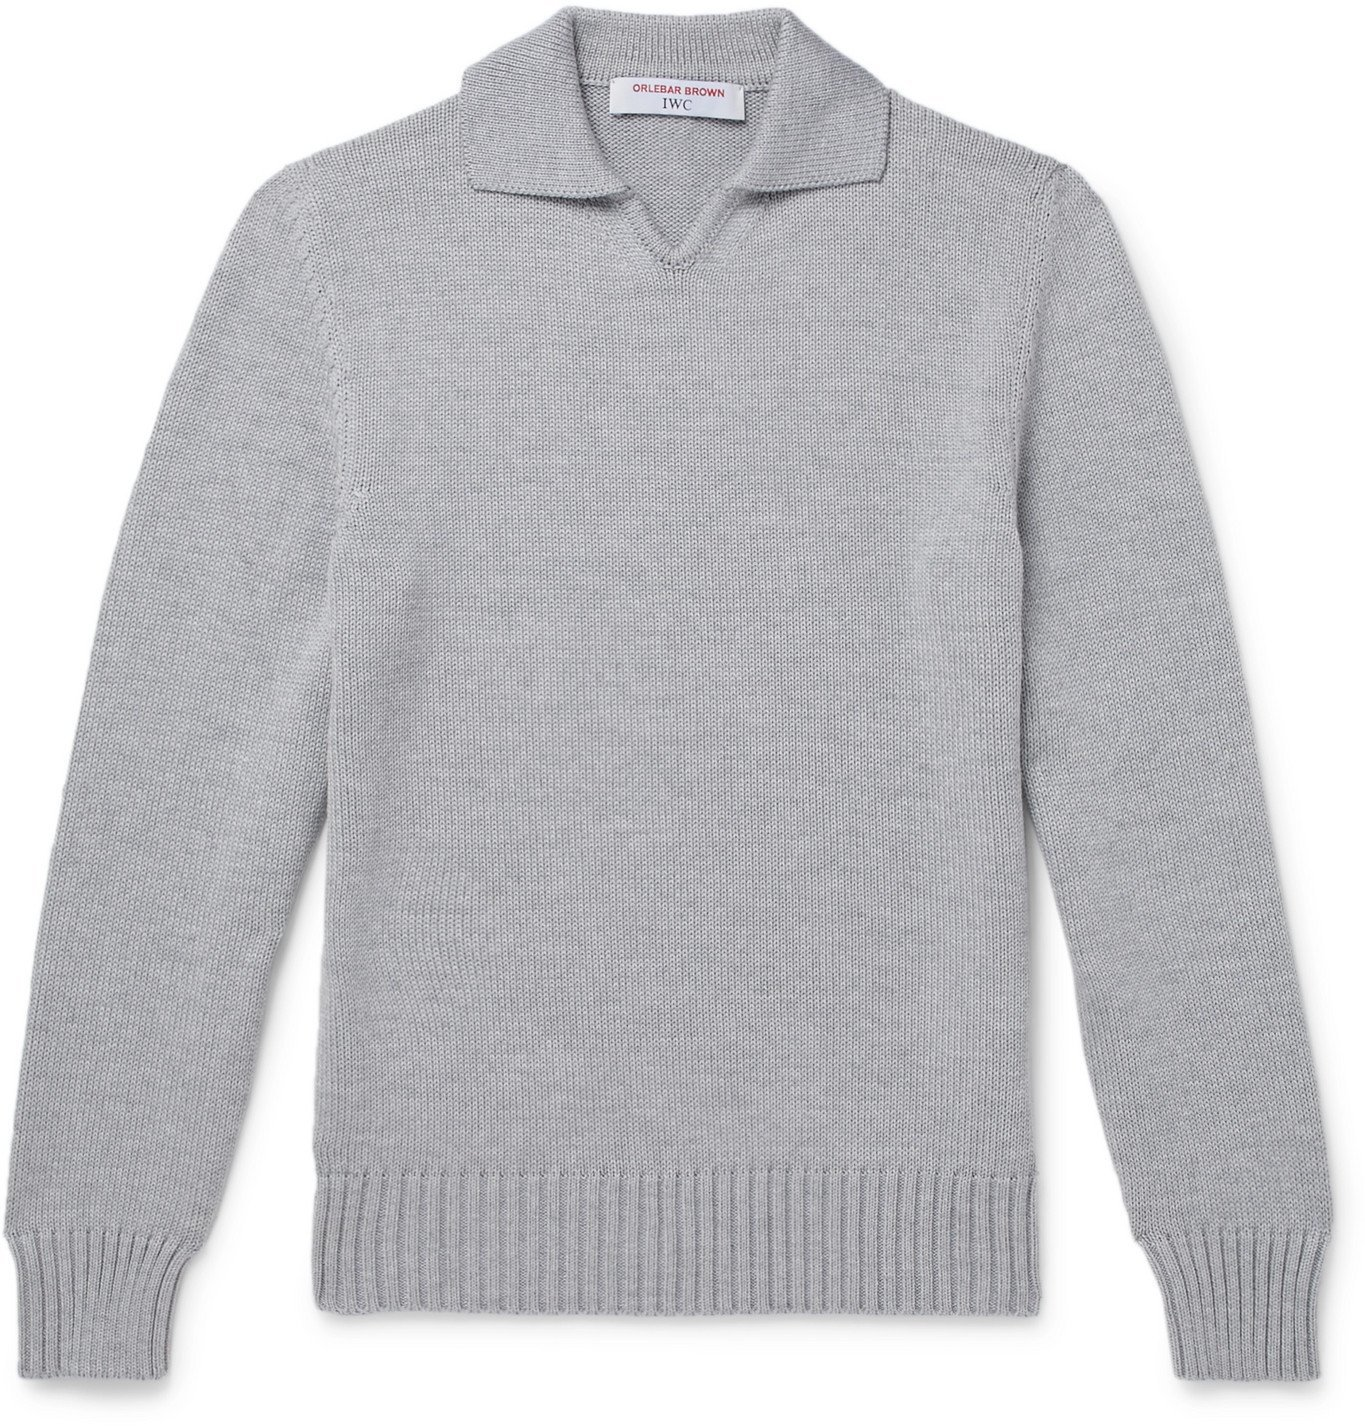 Photo: Orlebar Brown - IWC Schaffhausen Headley Slim-Fit Cable-Knit Merino Wool Sweater - Gray